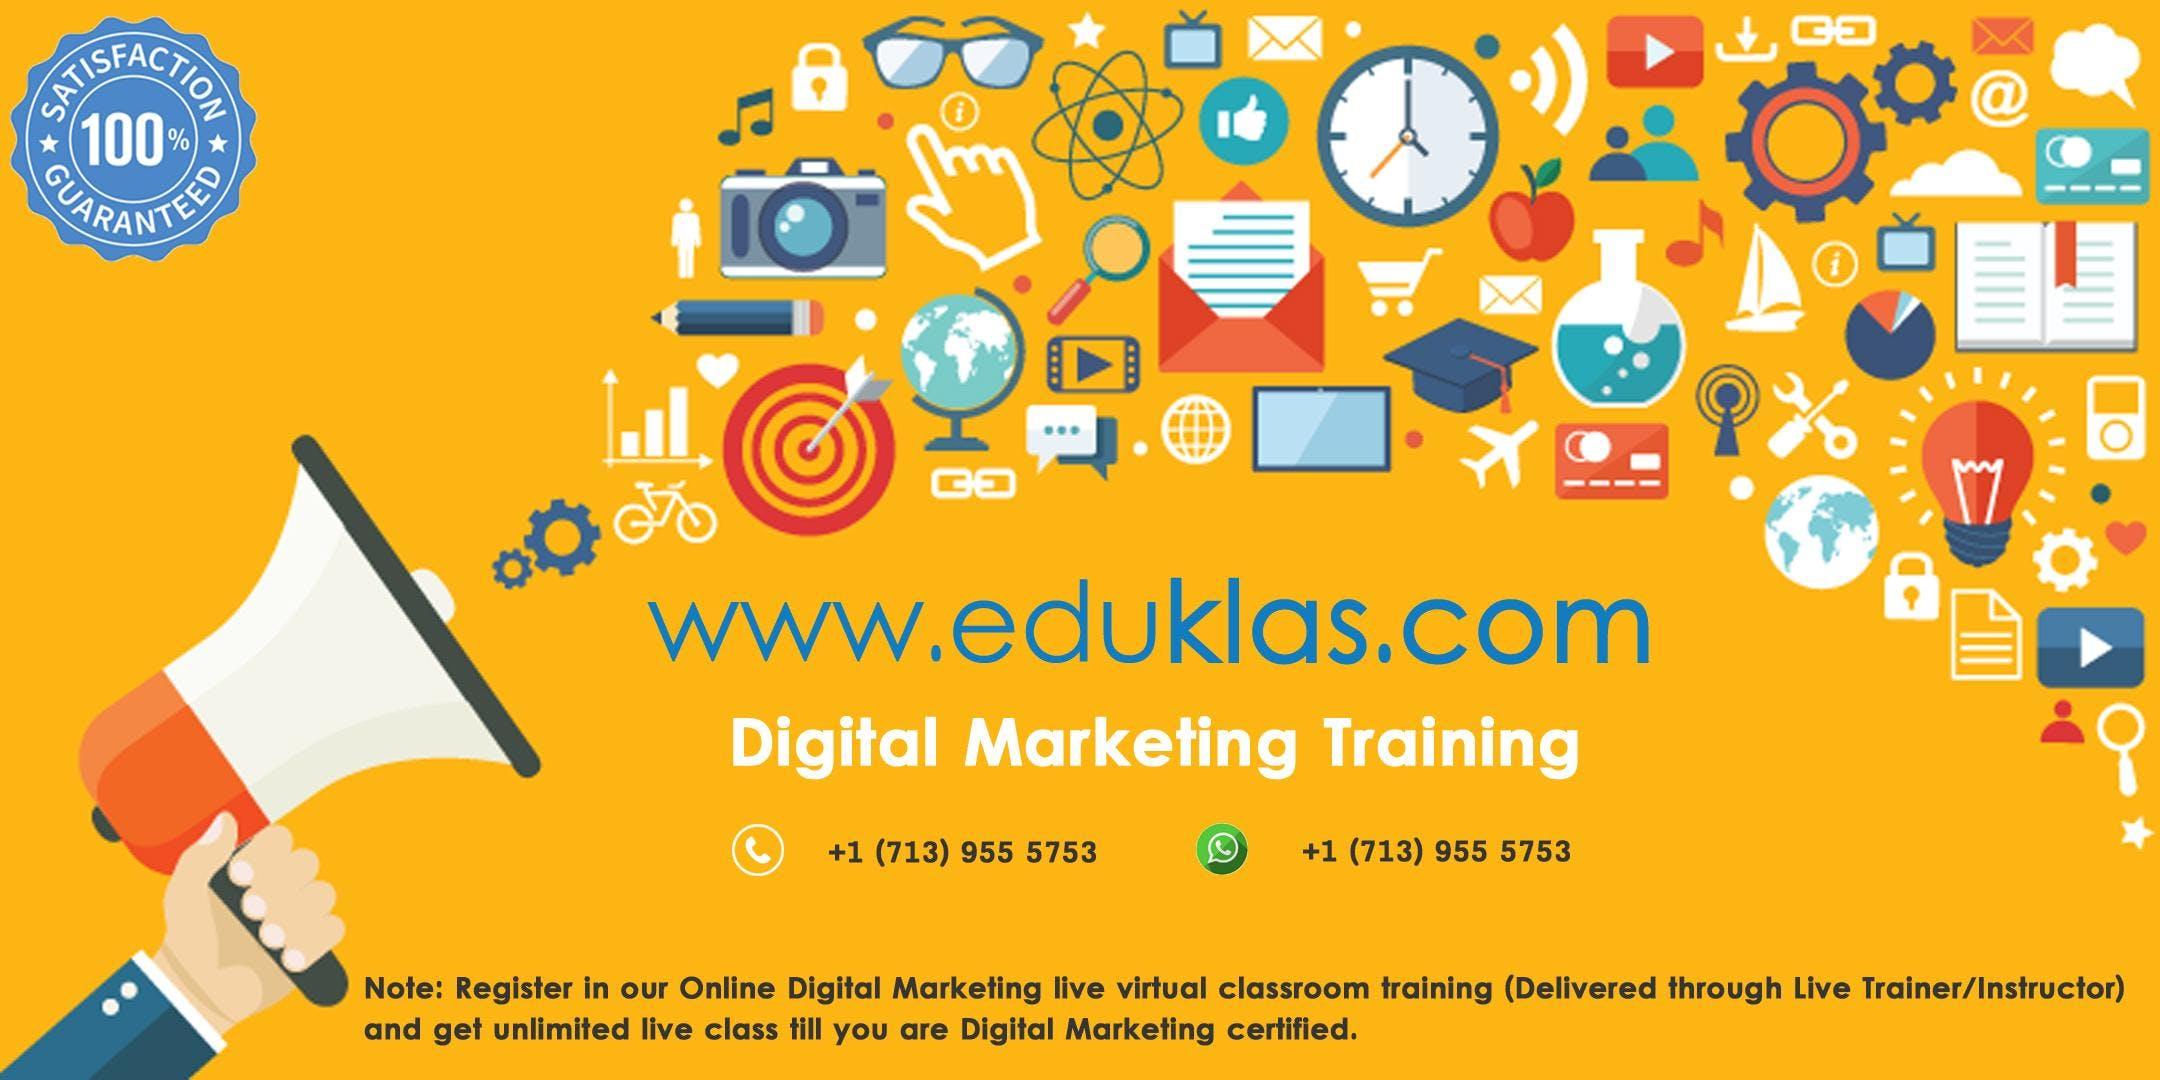 Digital Marketing Live Virtual Classroom Trai